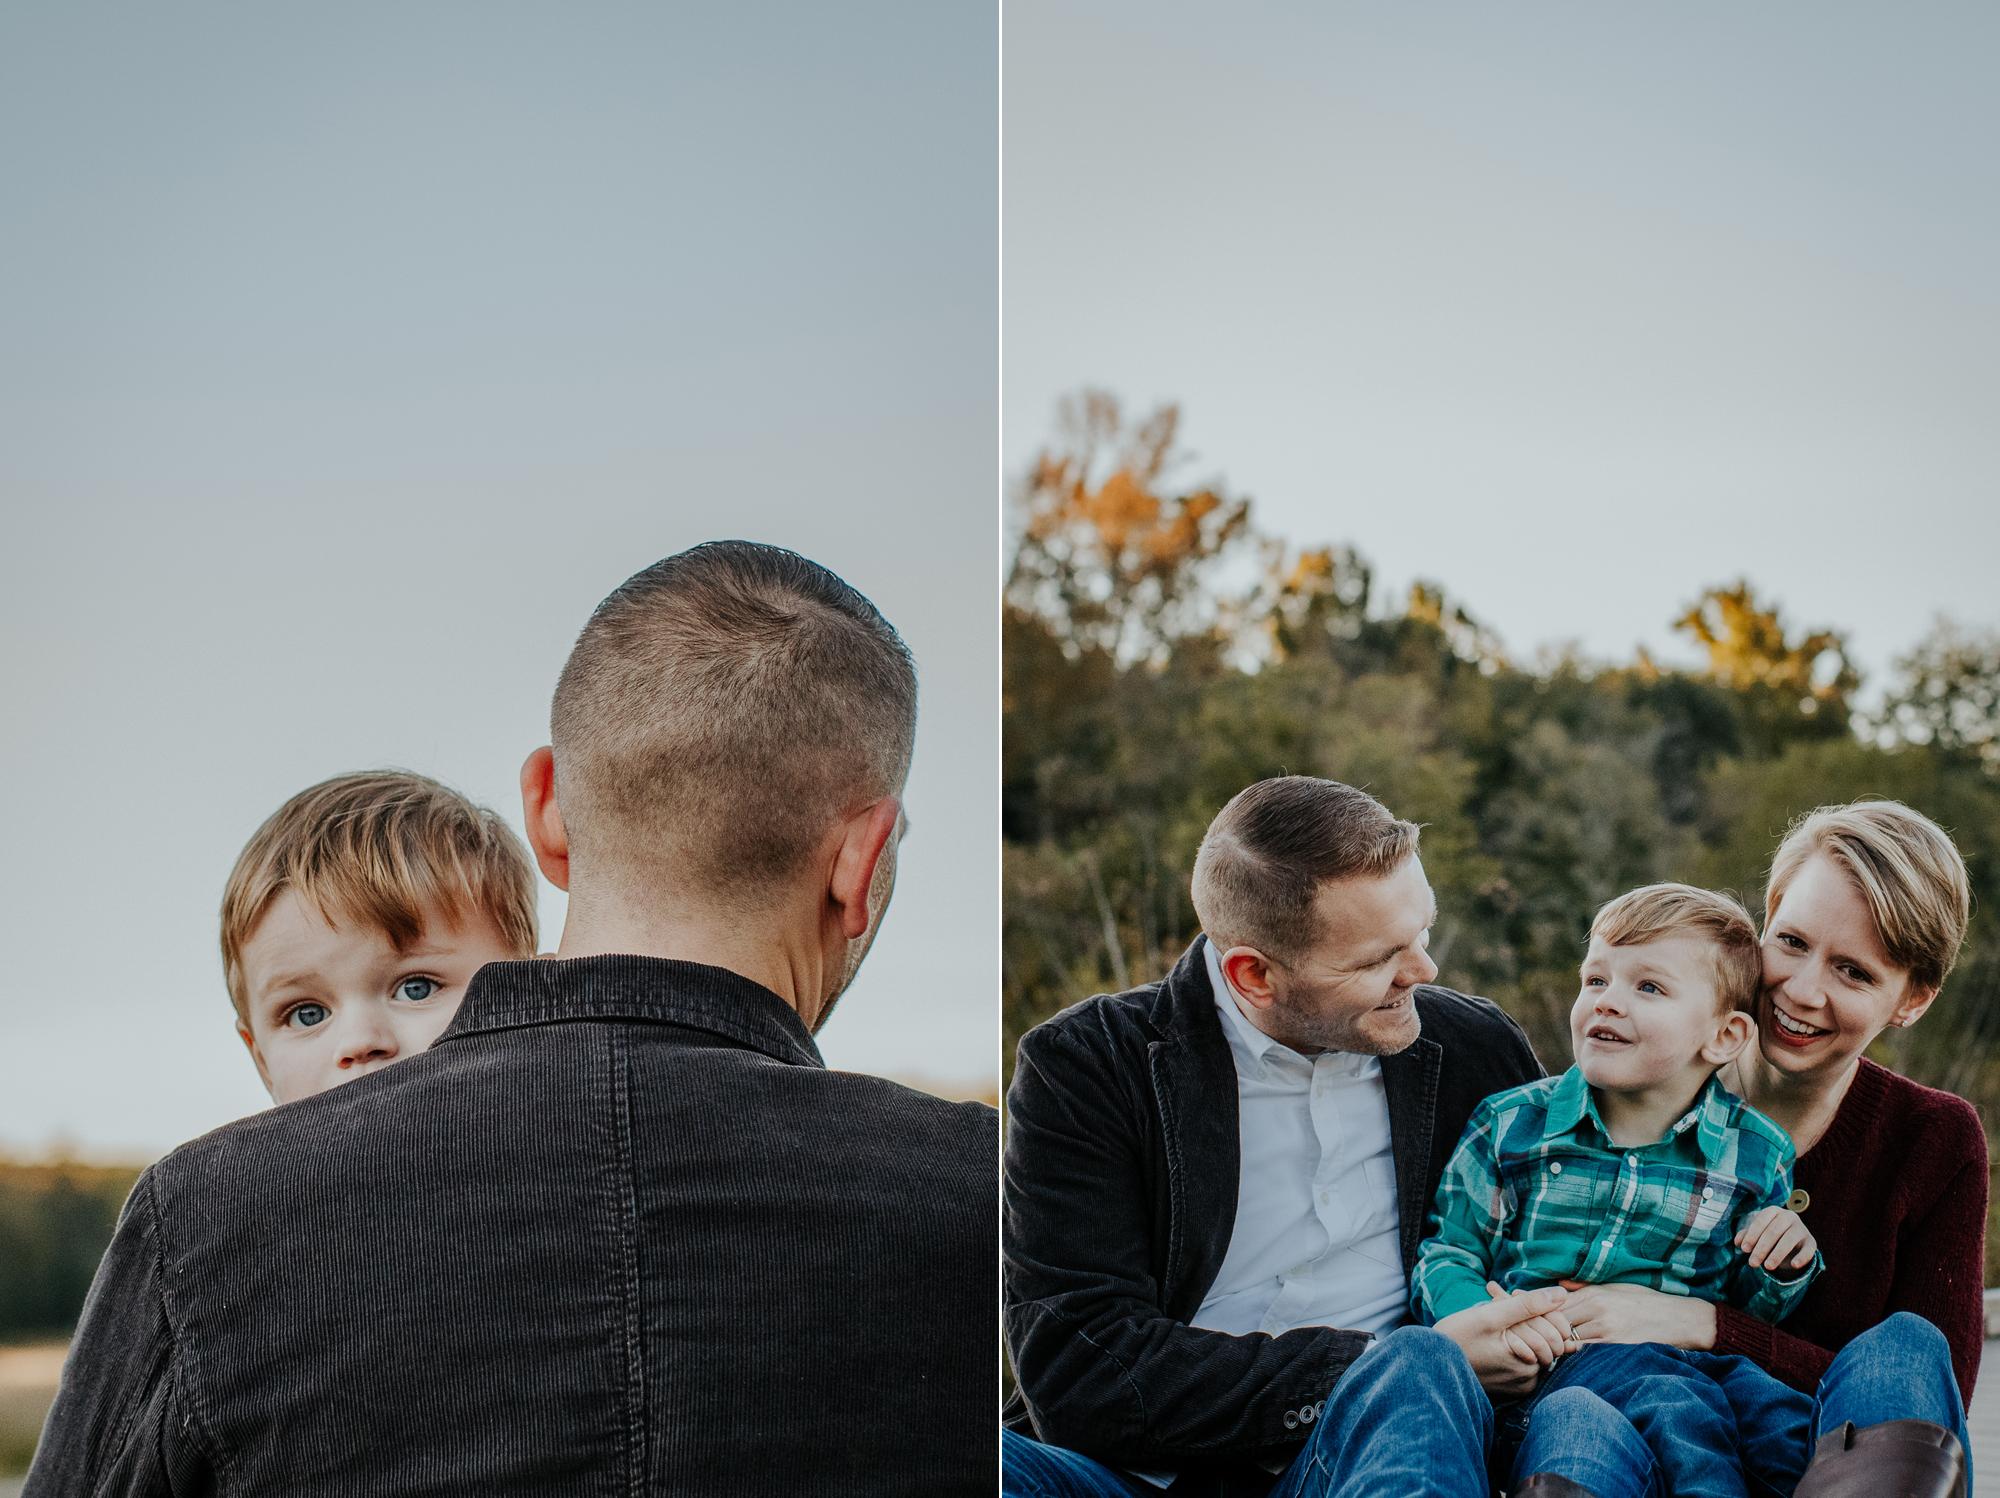 026-huntley_meadows_family_photography.jpg